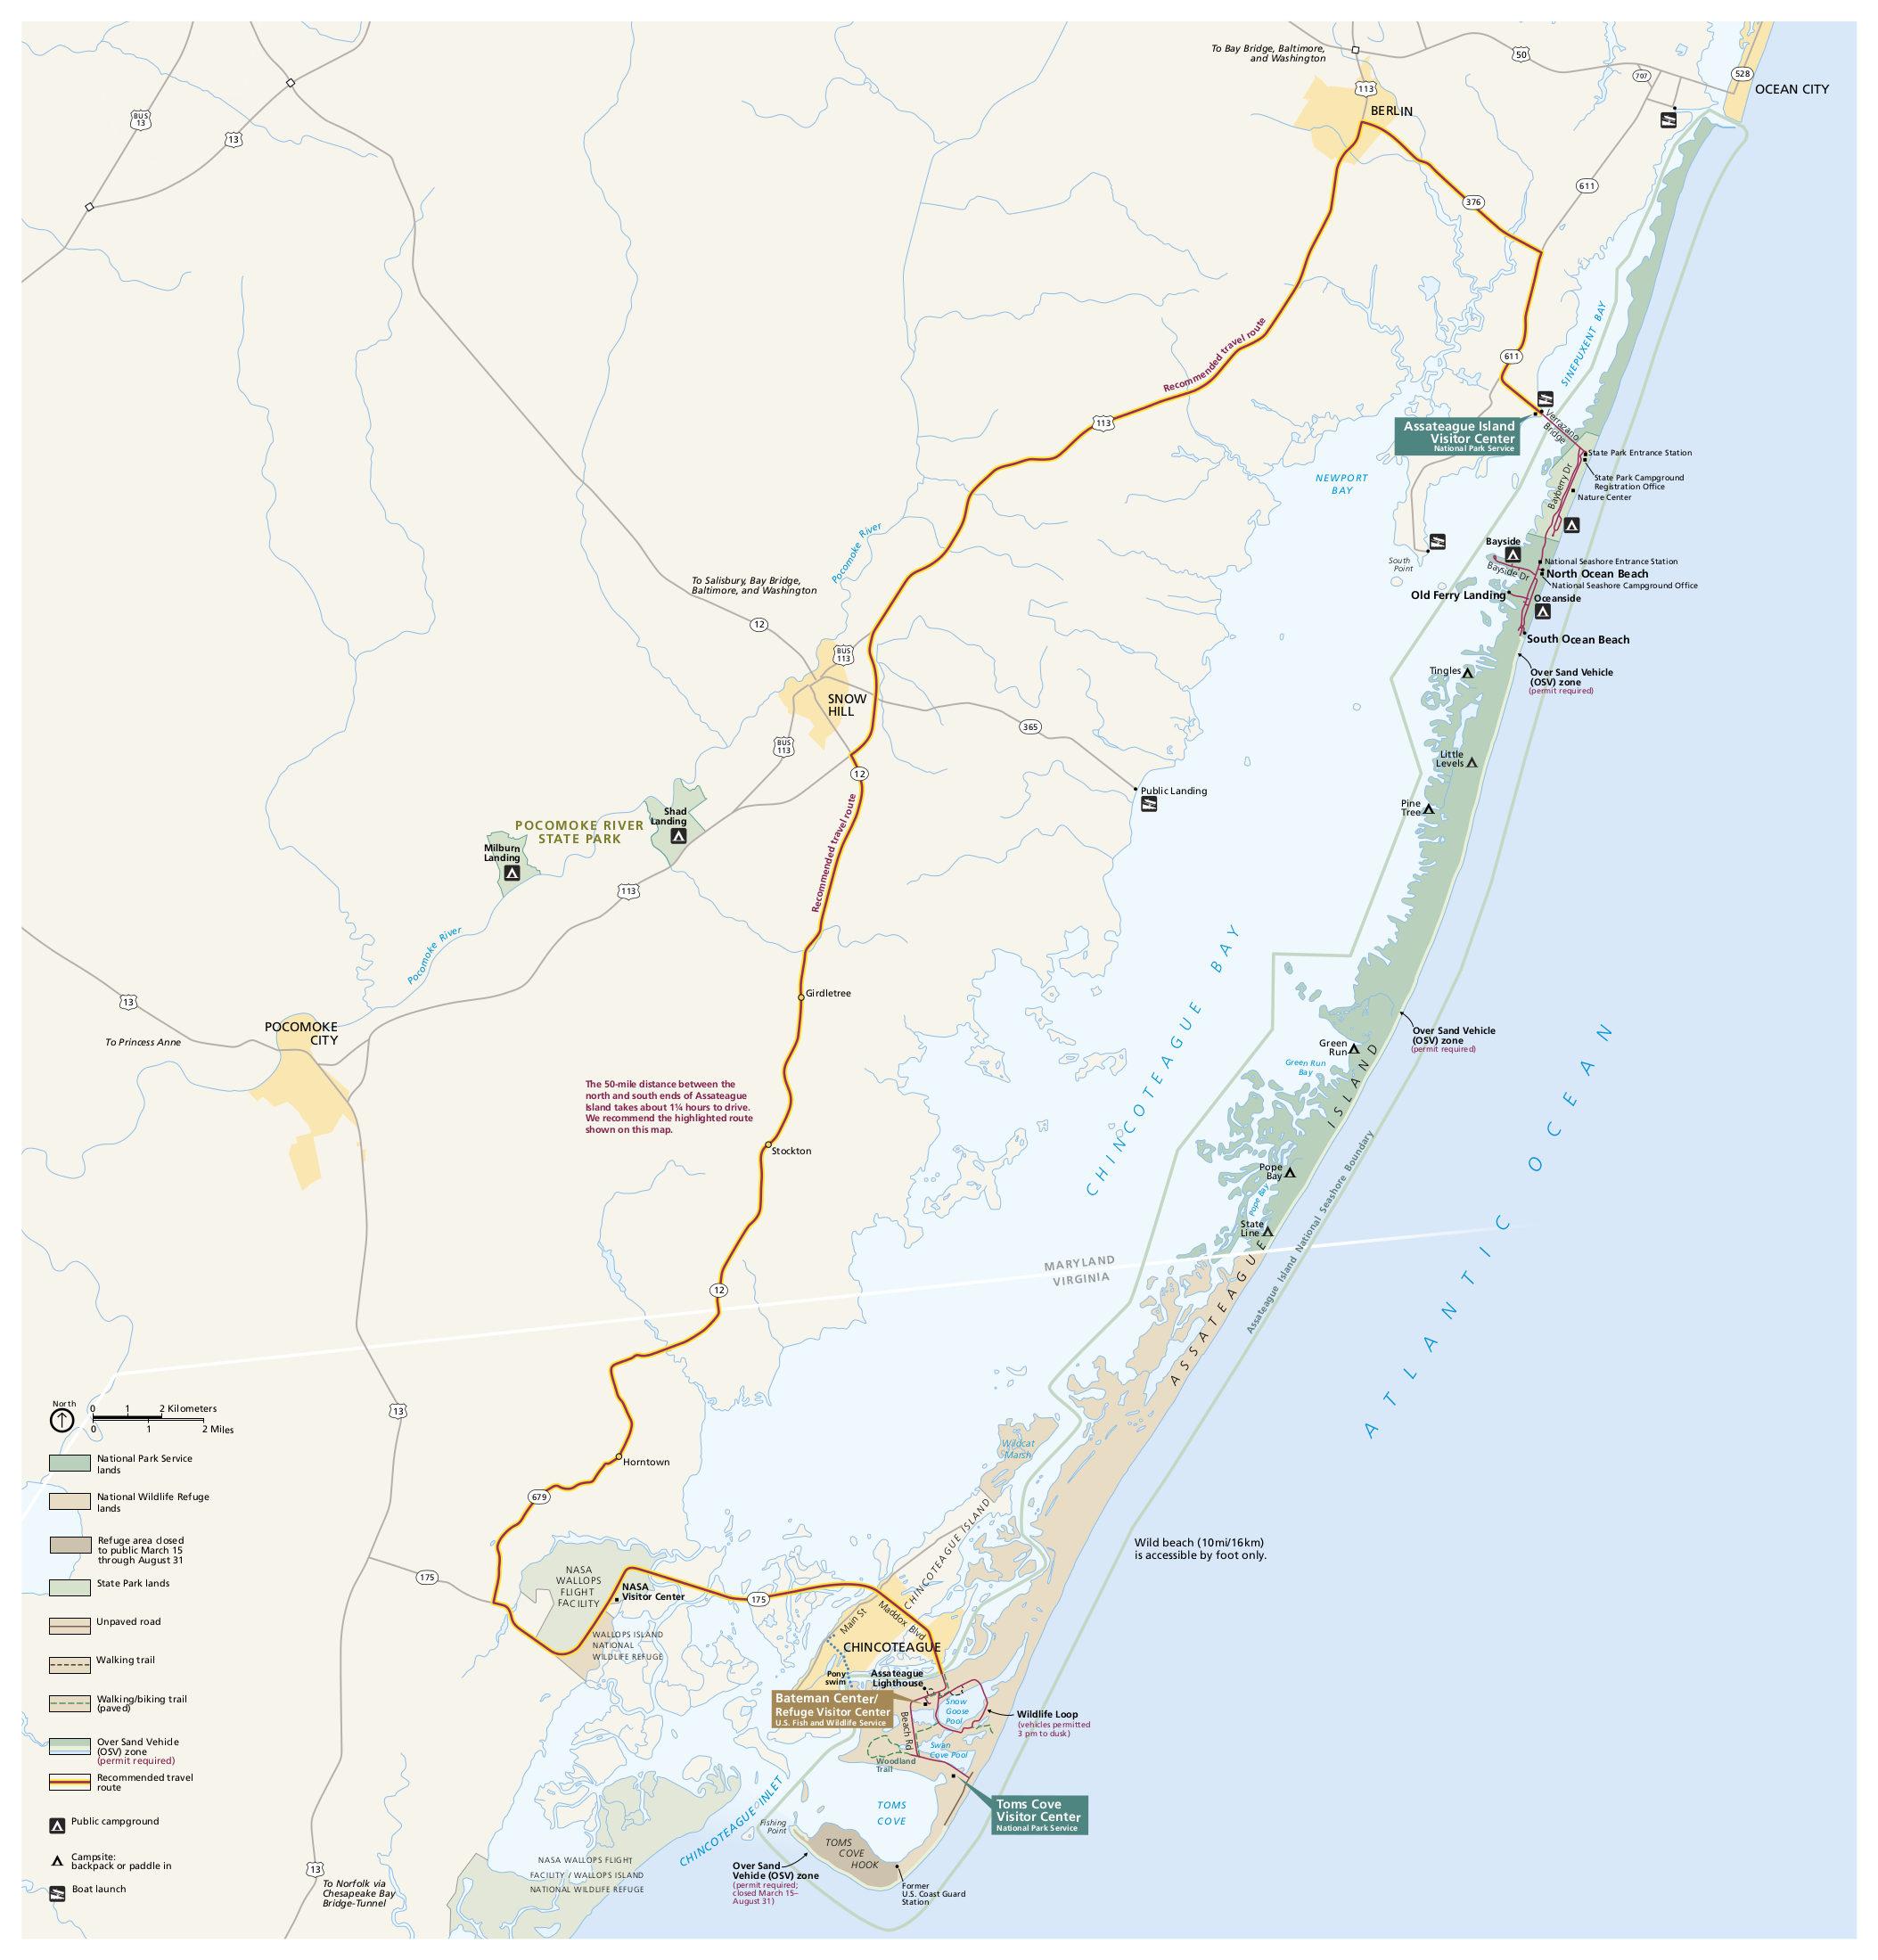 Map Of Assateague Island Assateague Island Maps | NPMaps.  just free maps, period.